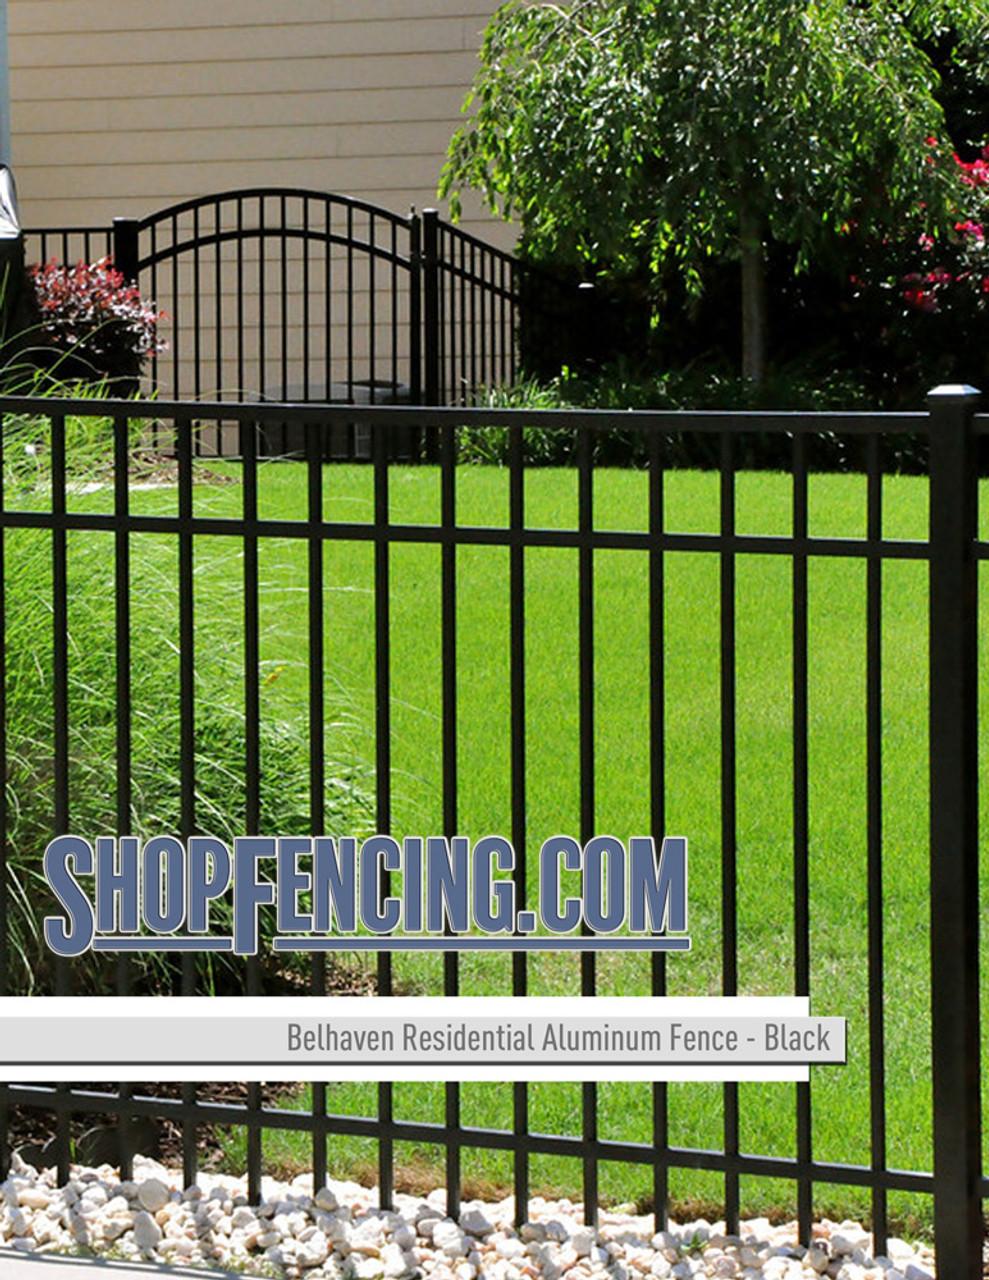 Black Residential Belhaven Aluminum Fencing From ShopFencing.com